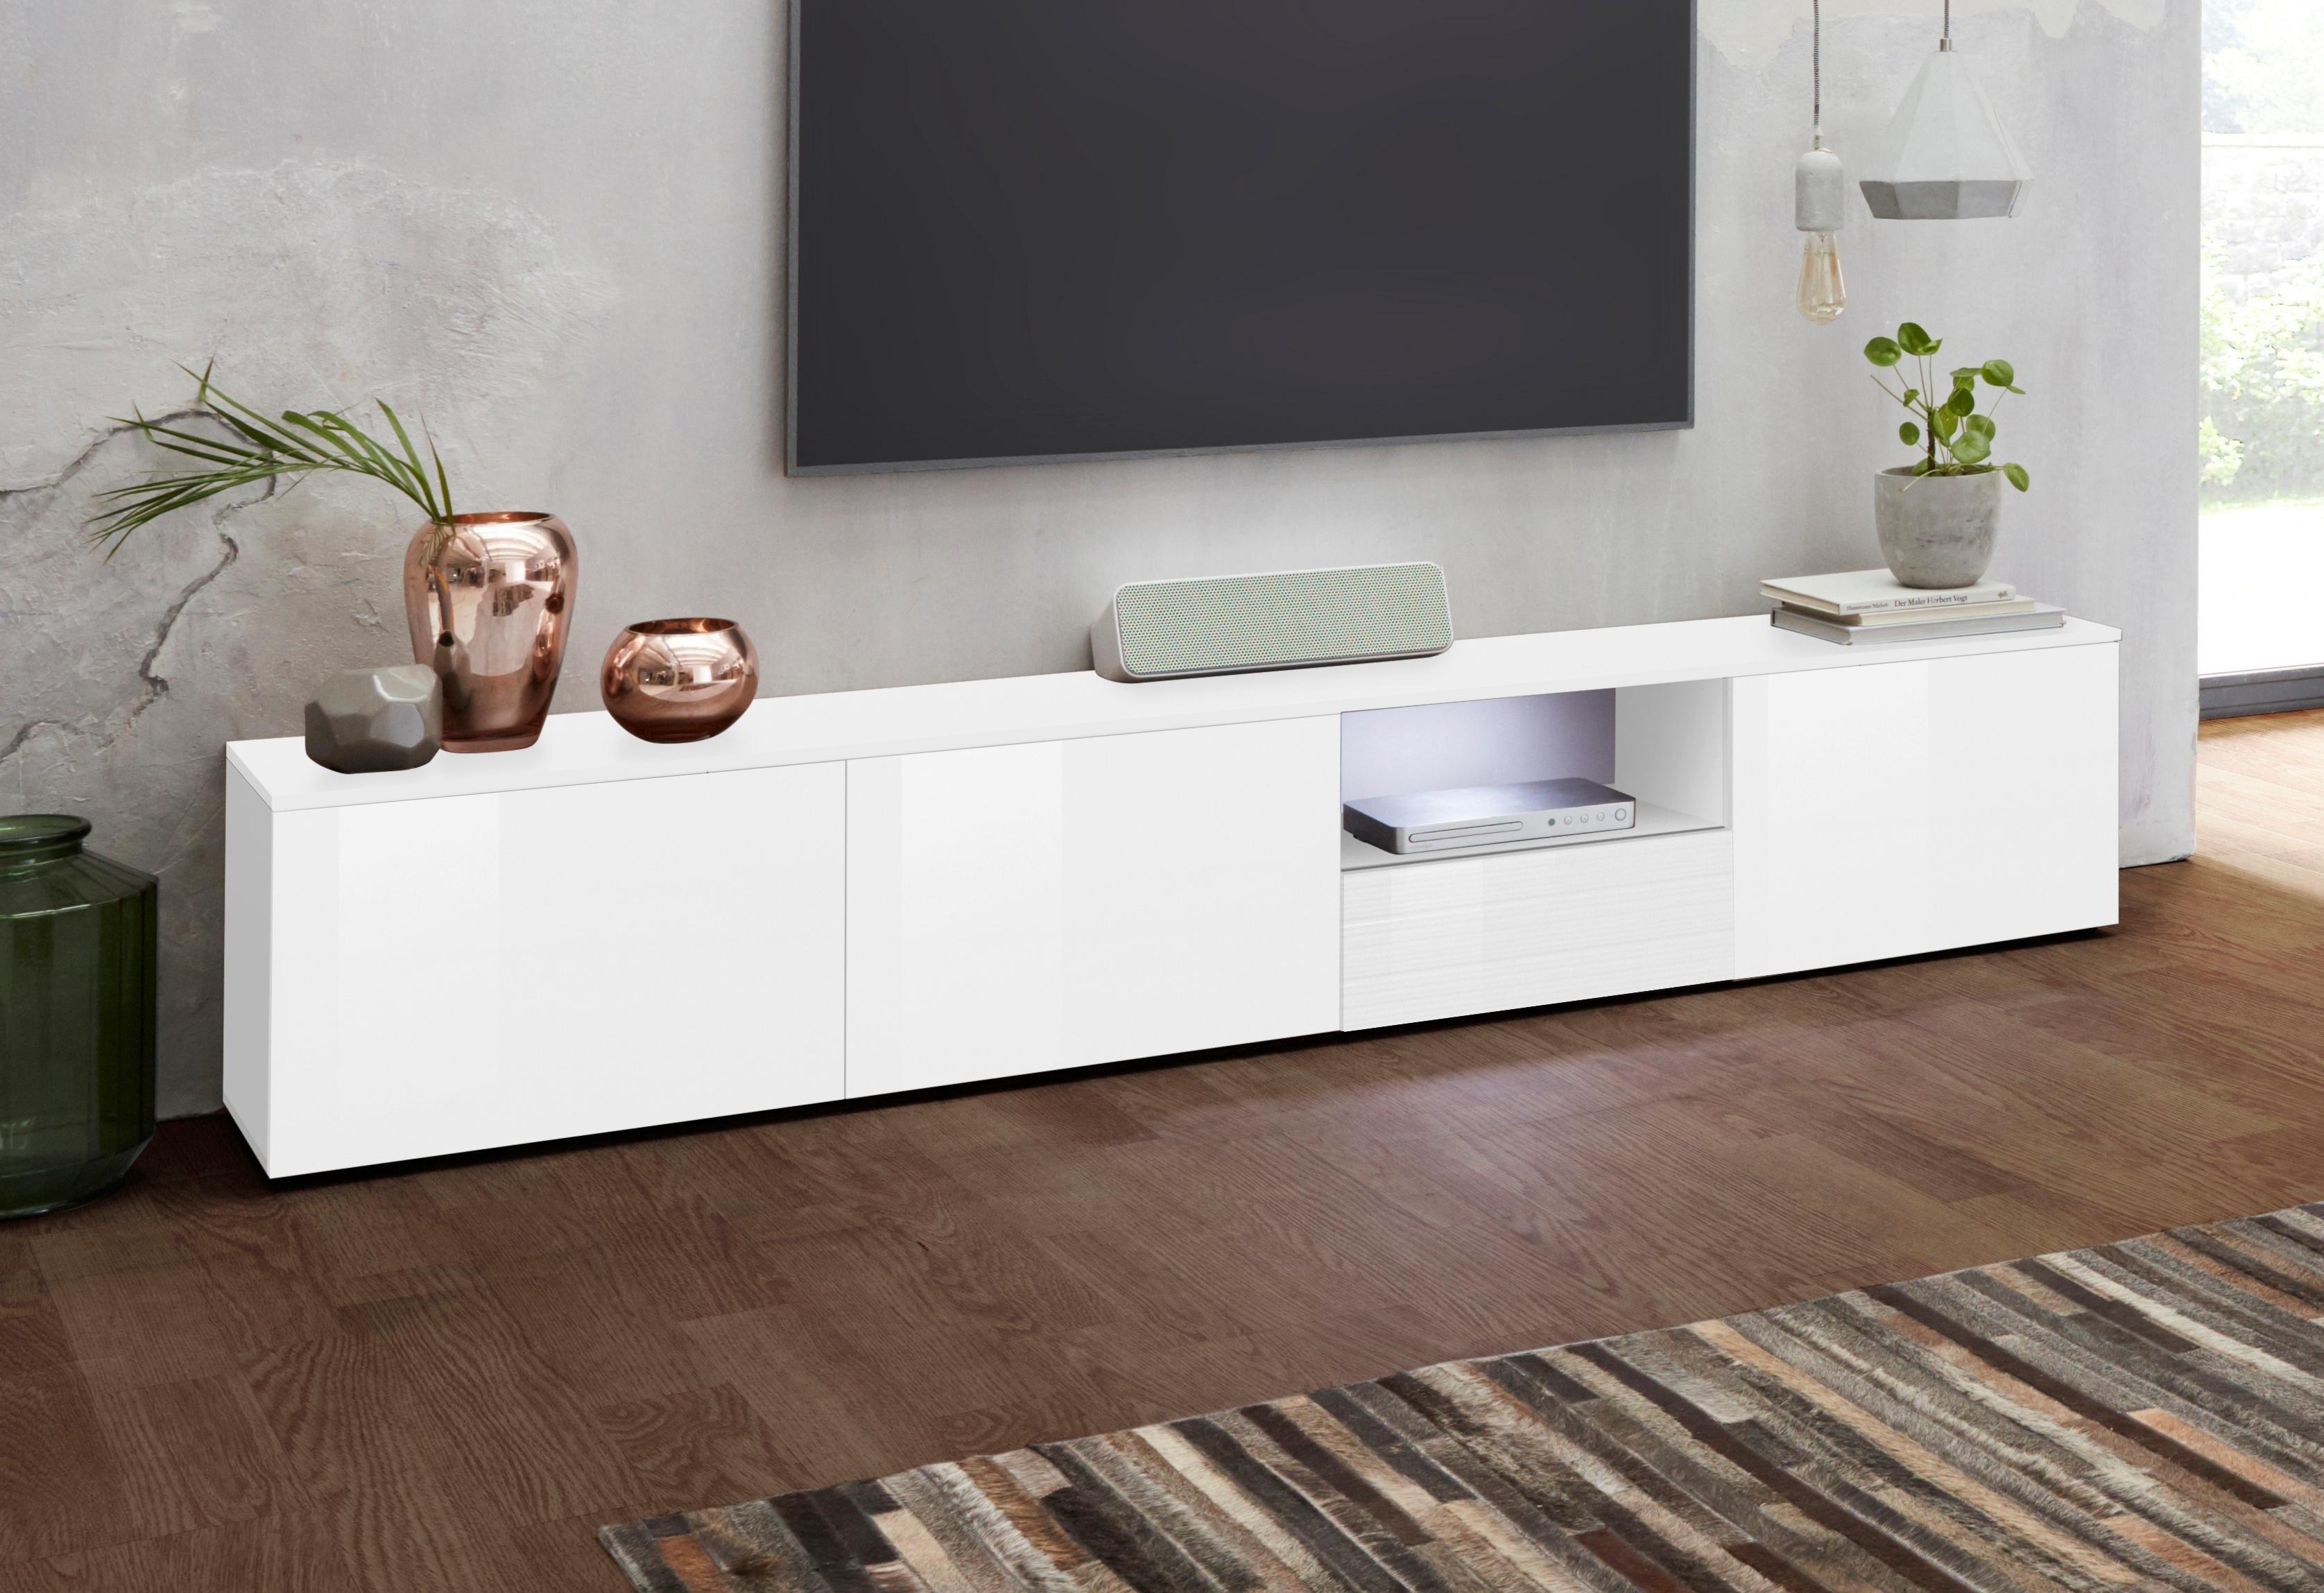 borchardt Möbel tv-meubel Savannah Breedte 200 cm nu online bestellen